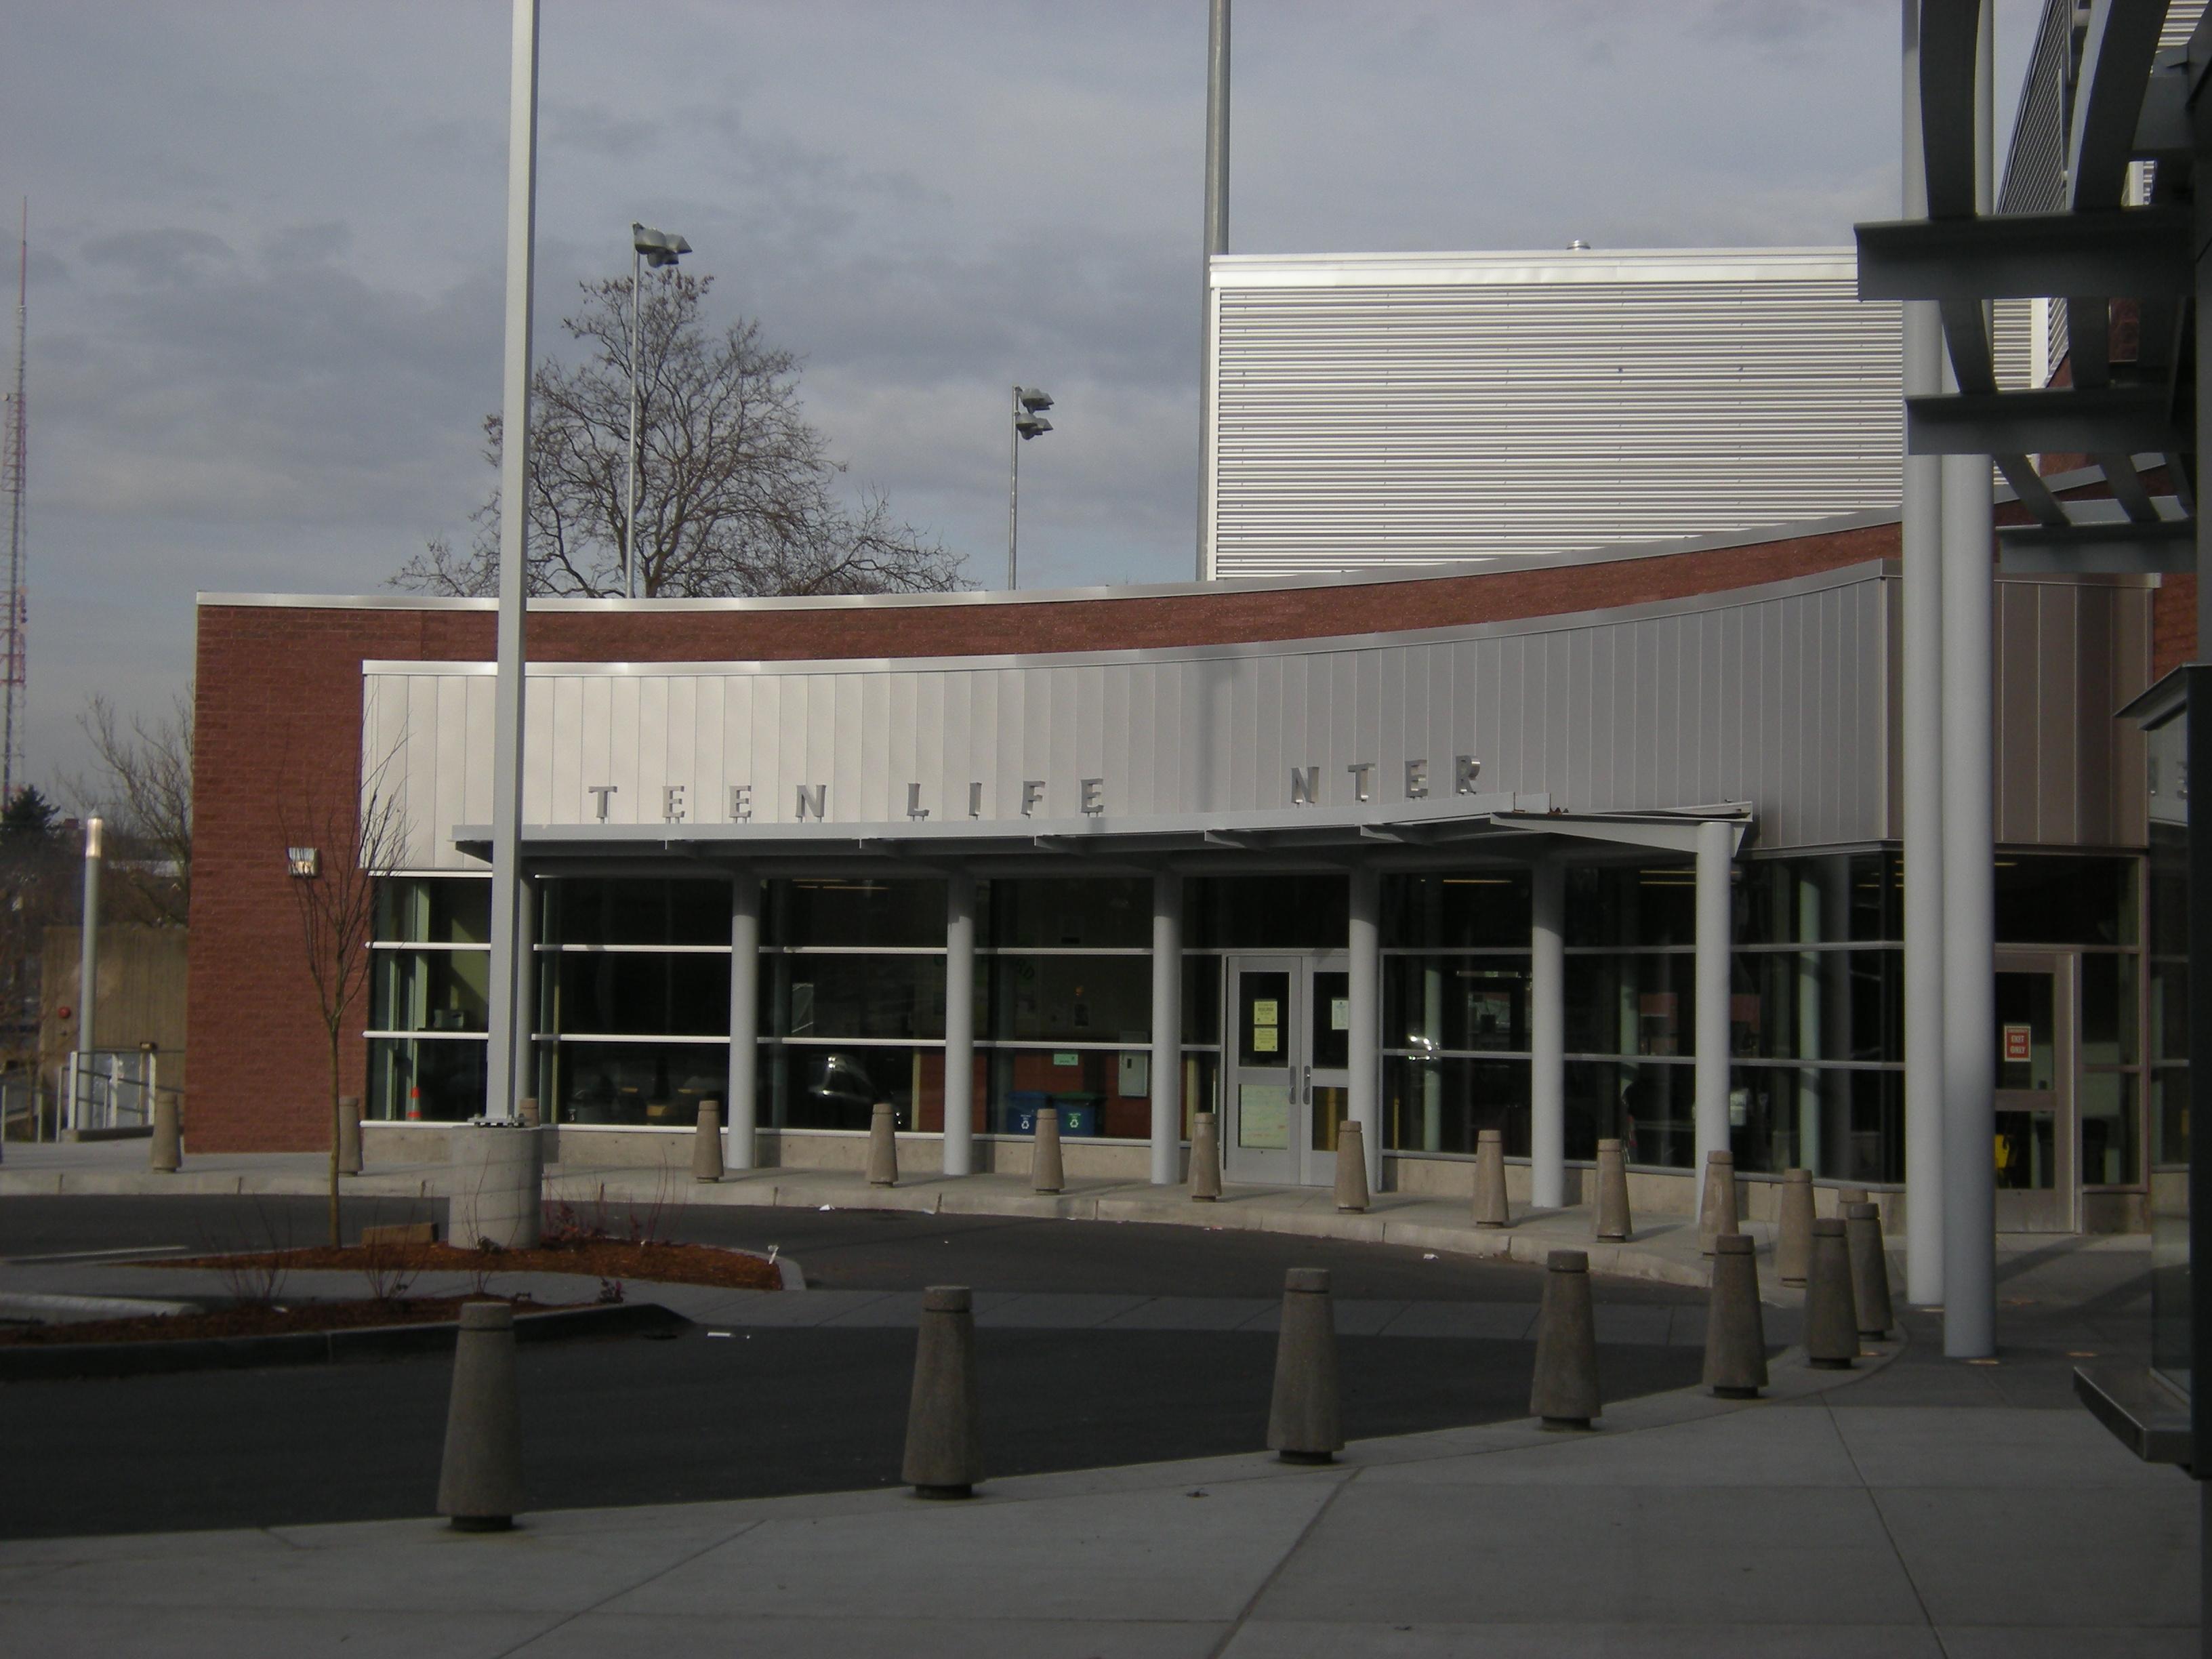 File Seattle Garfield High School Teen Life Center 01 Jpg Wikimedia Commons